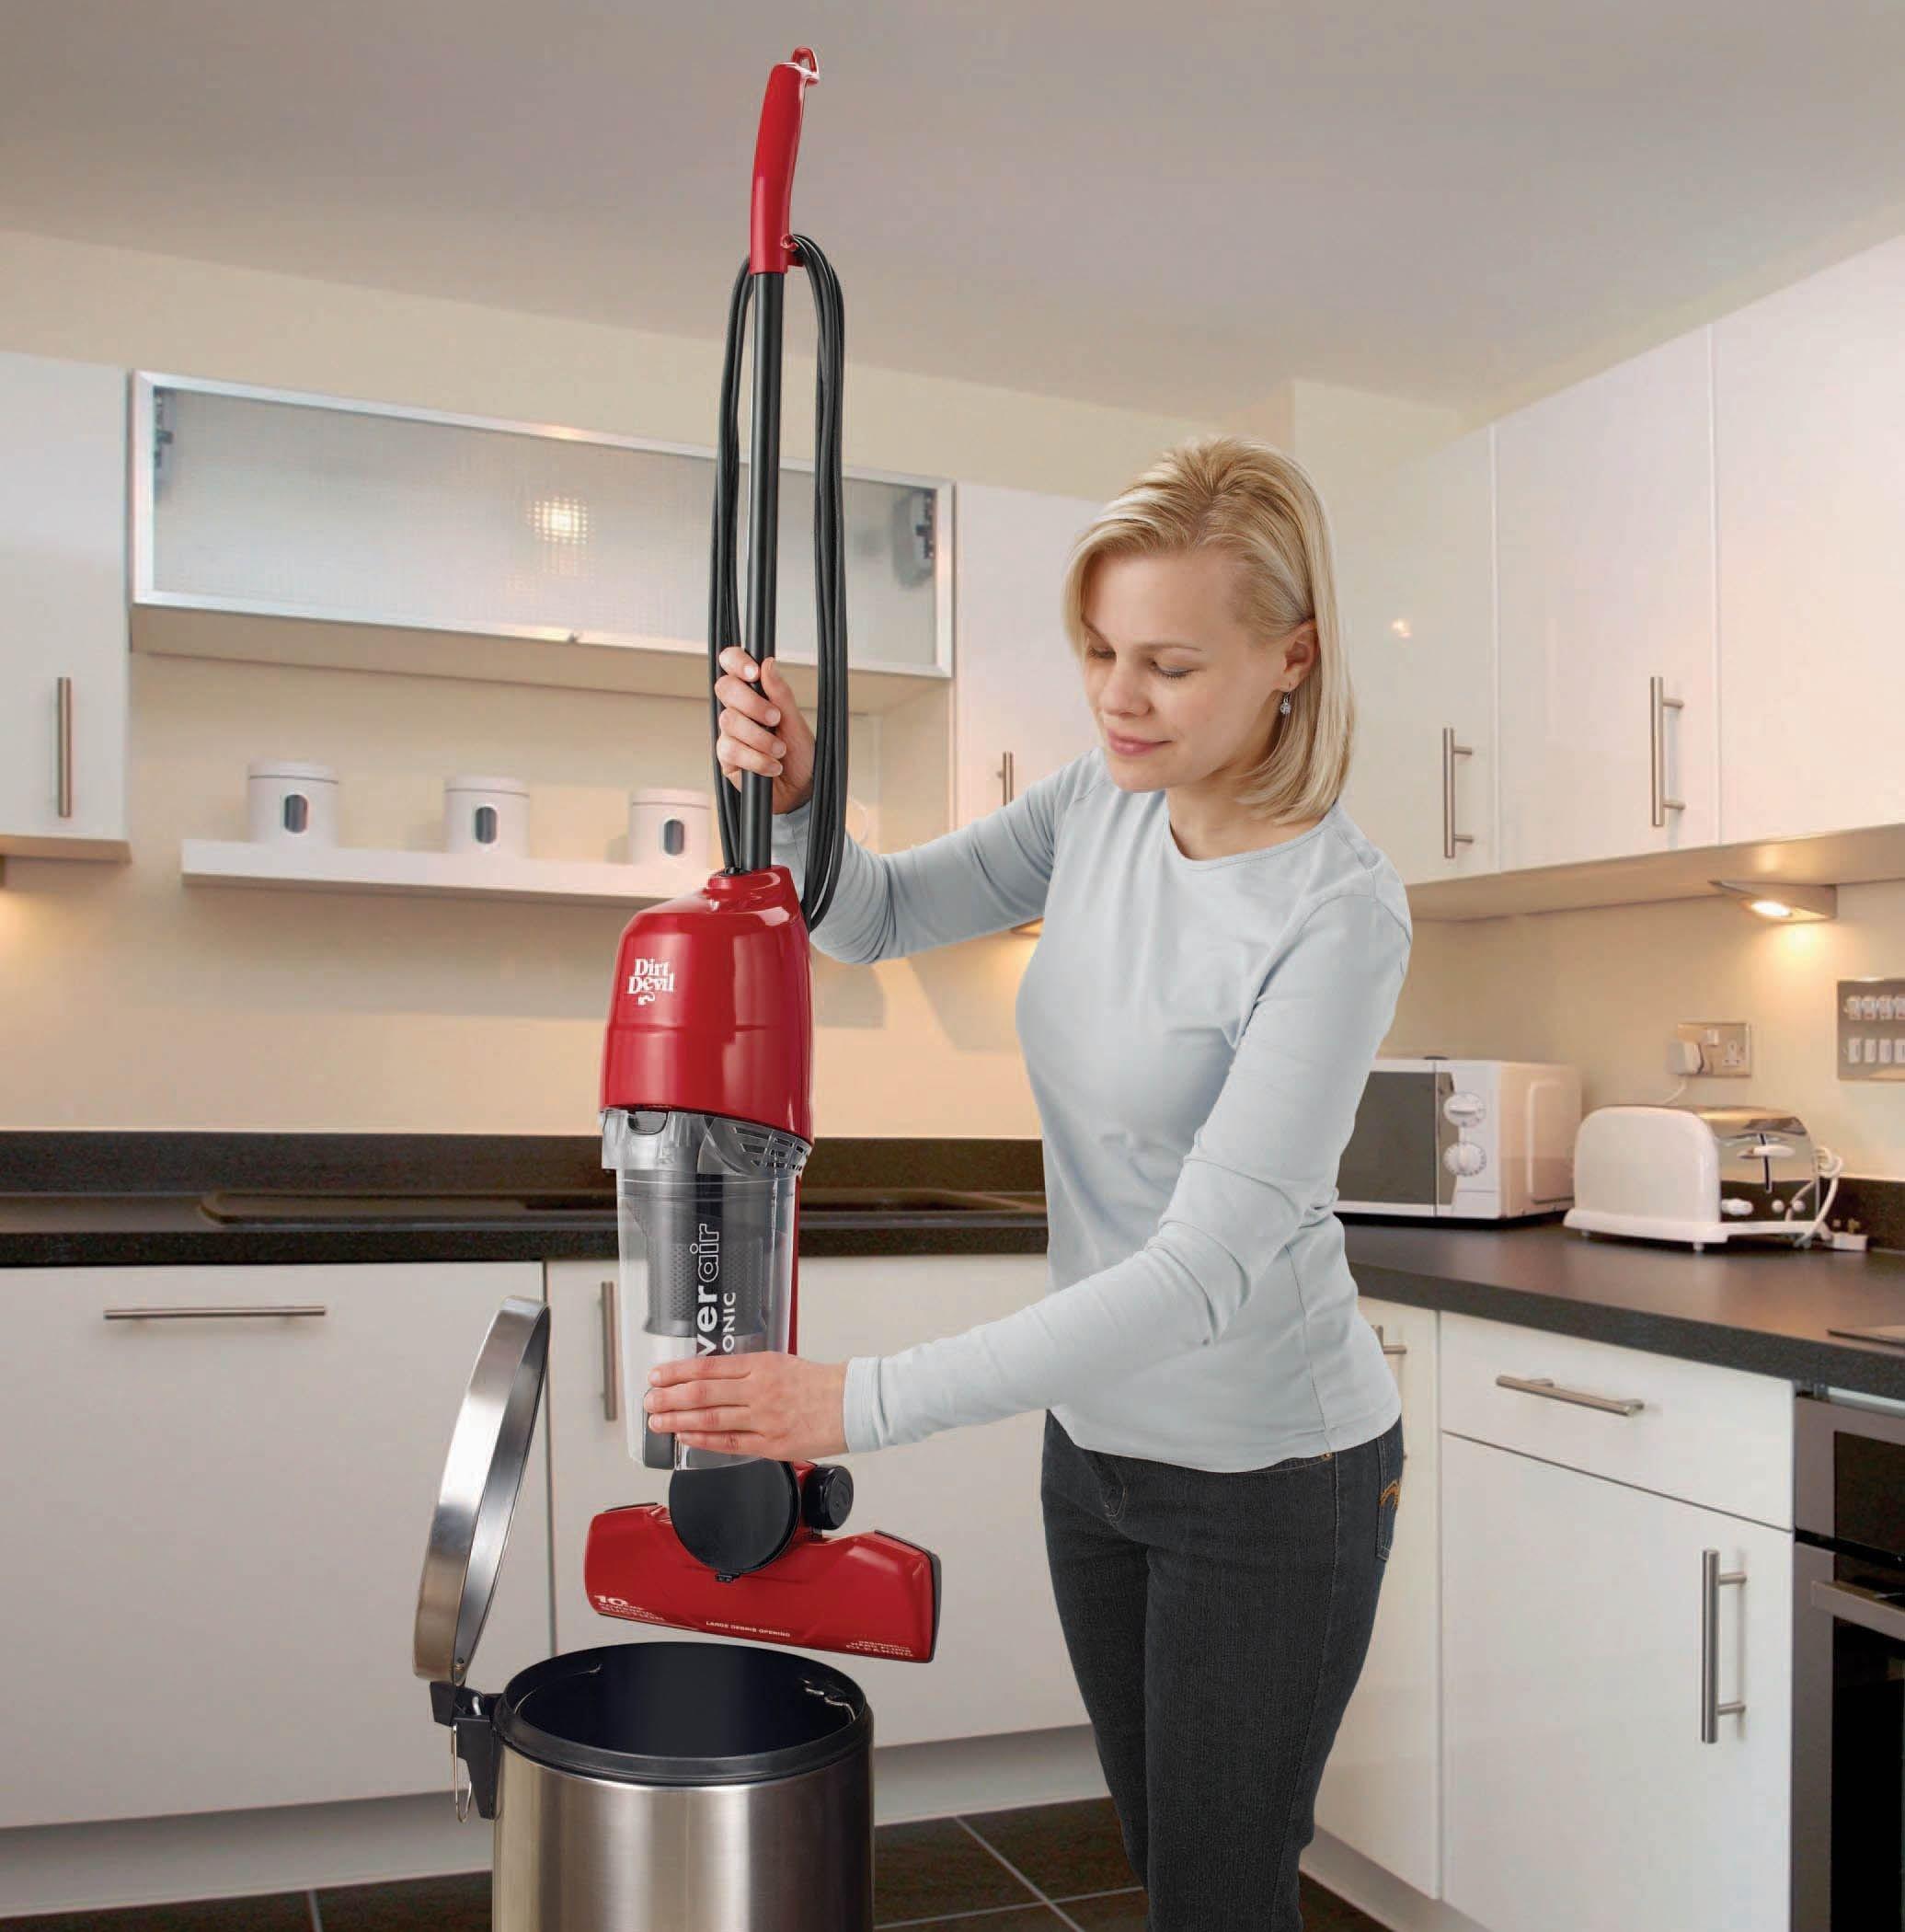 Power Air Cyclonic Corded Stick Vacuum6